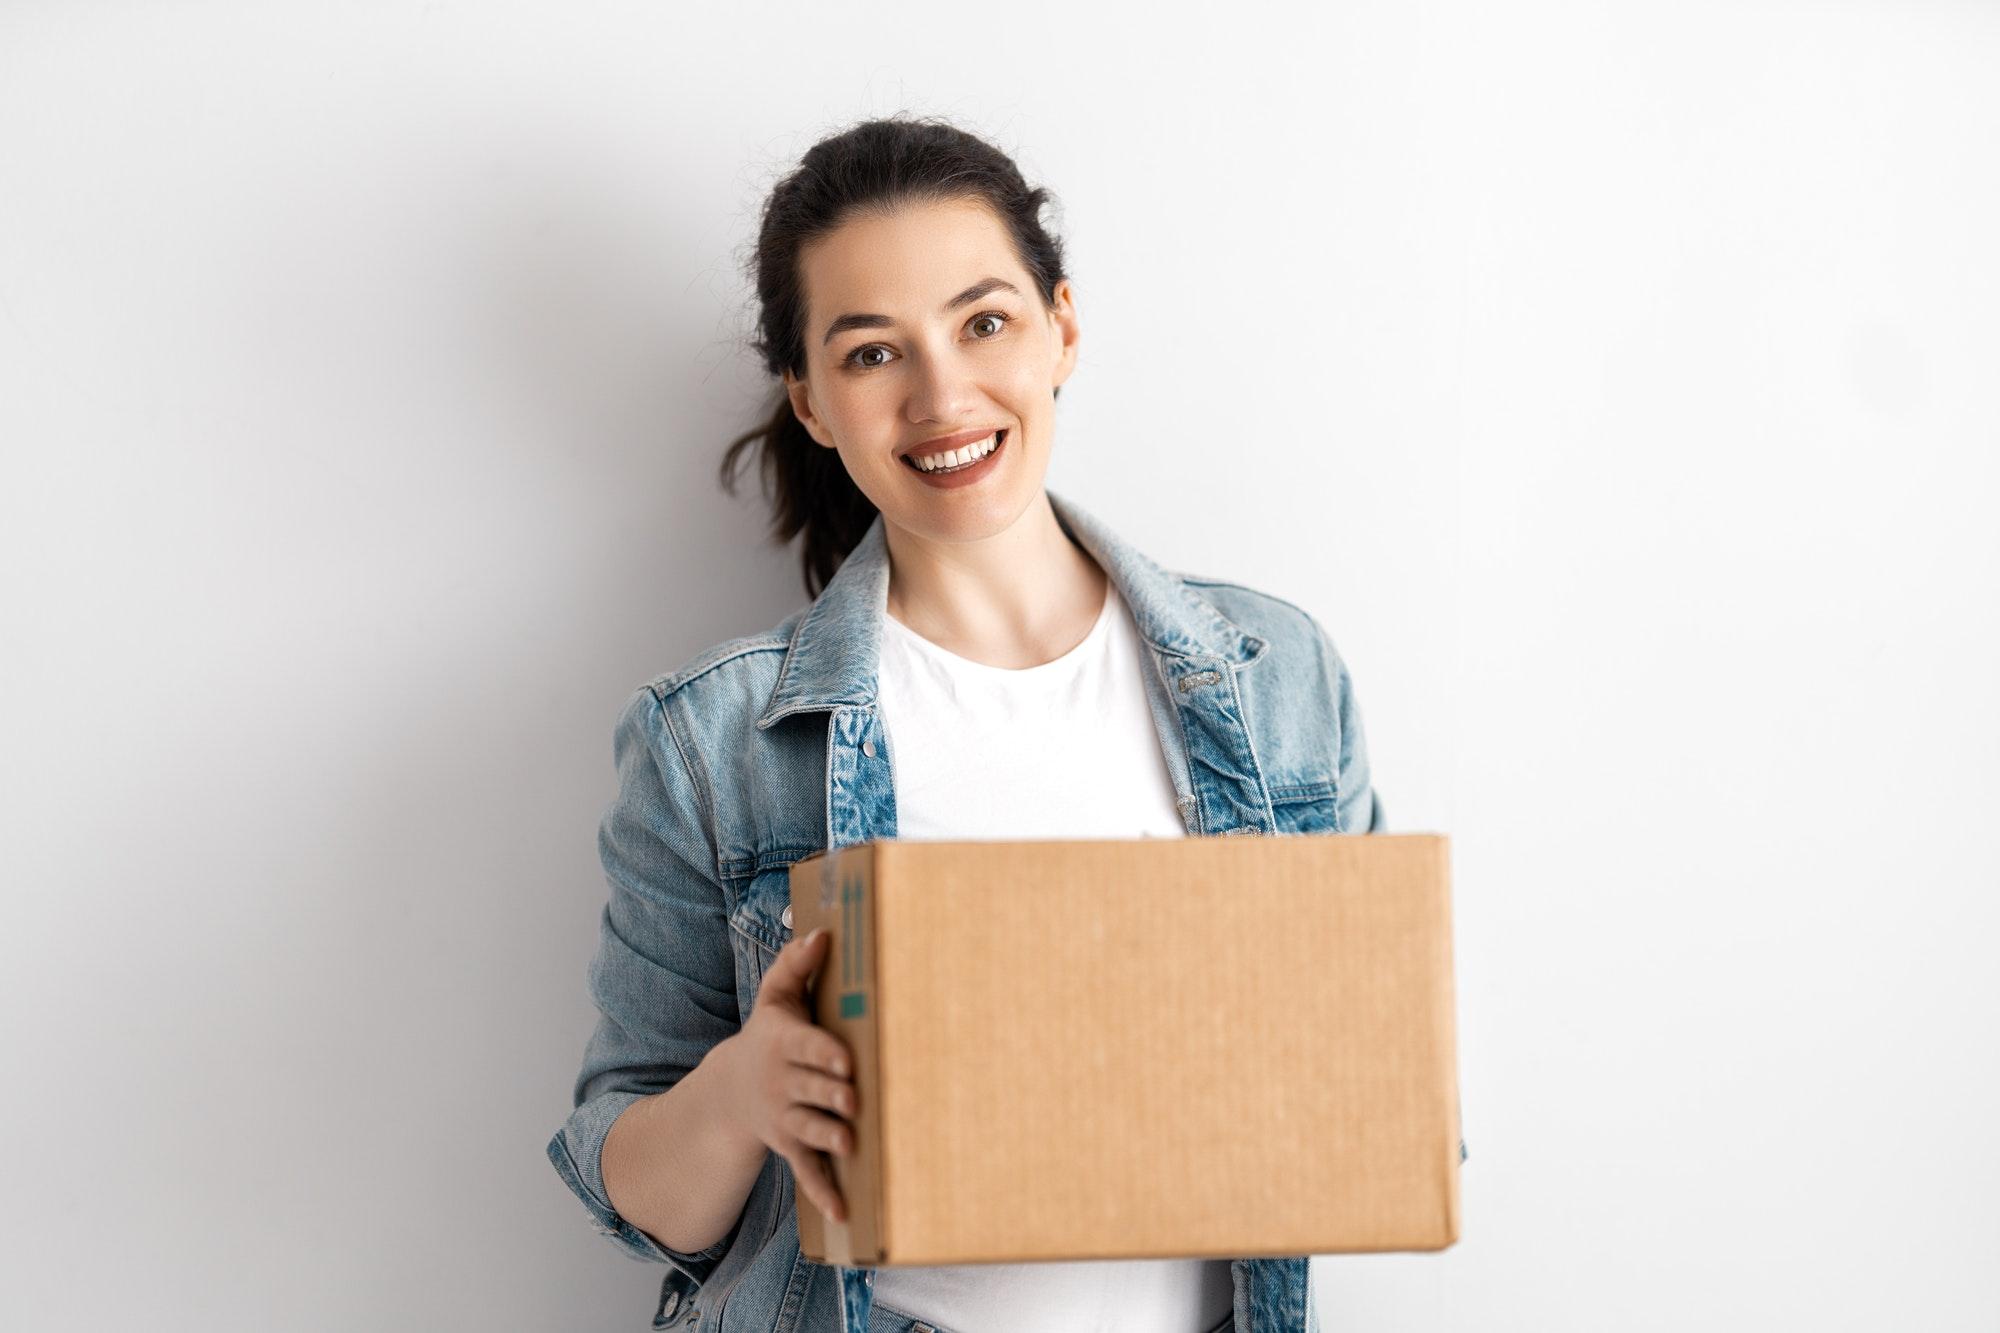 Happy woman with cardboard box.